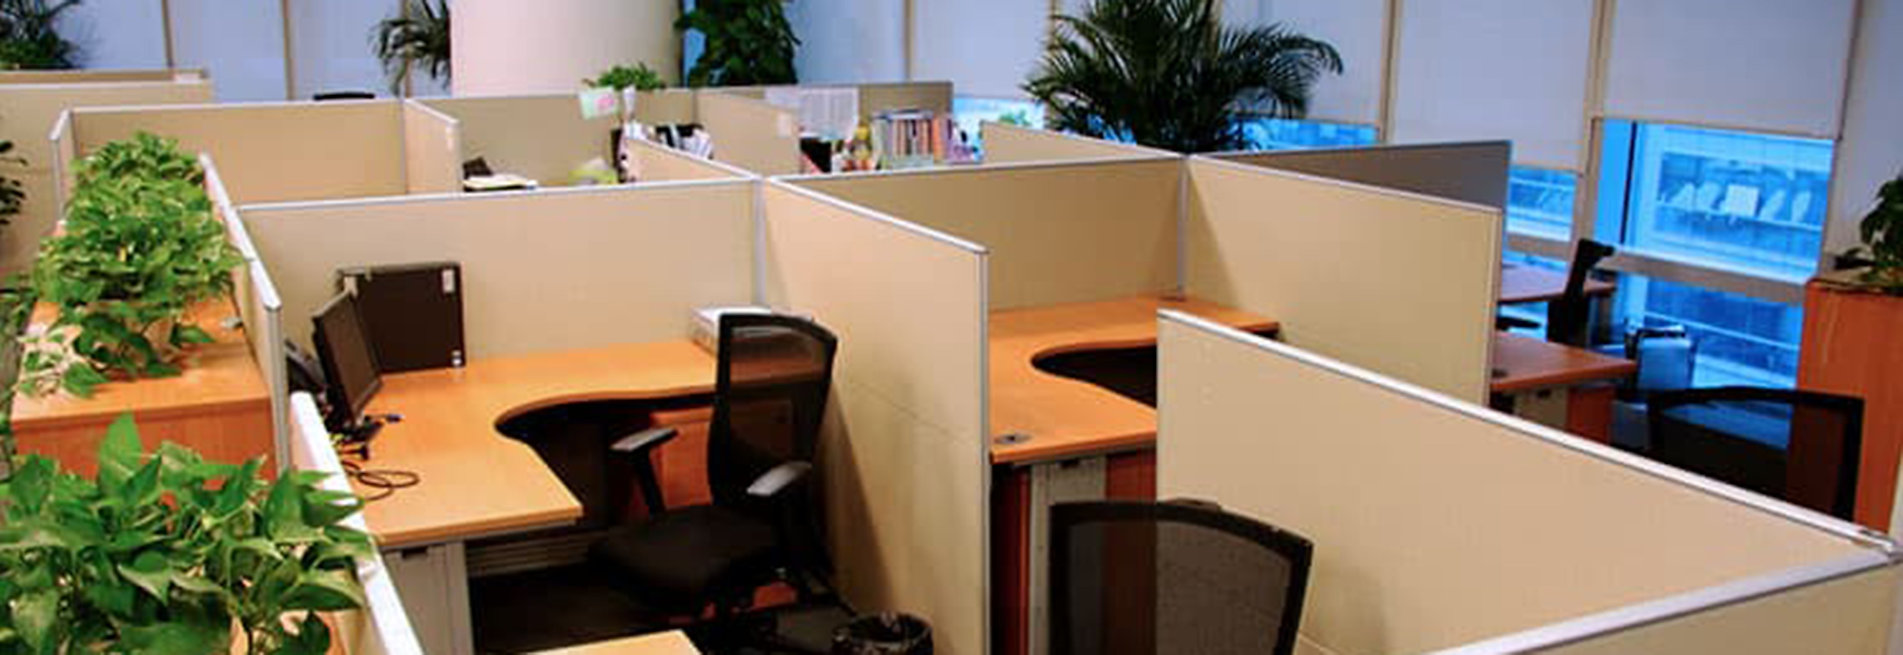 cubic-view-office-interior-design.jpg